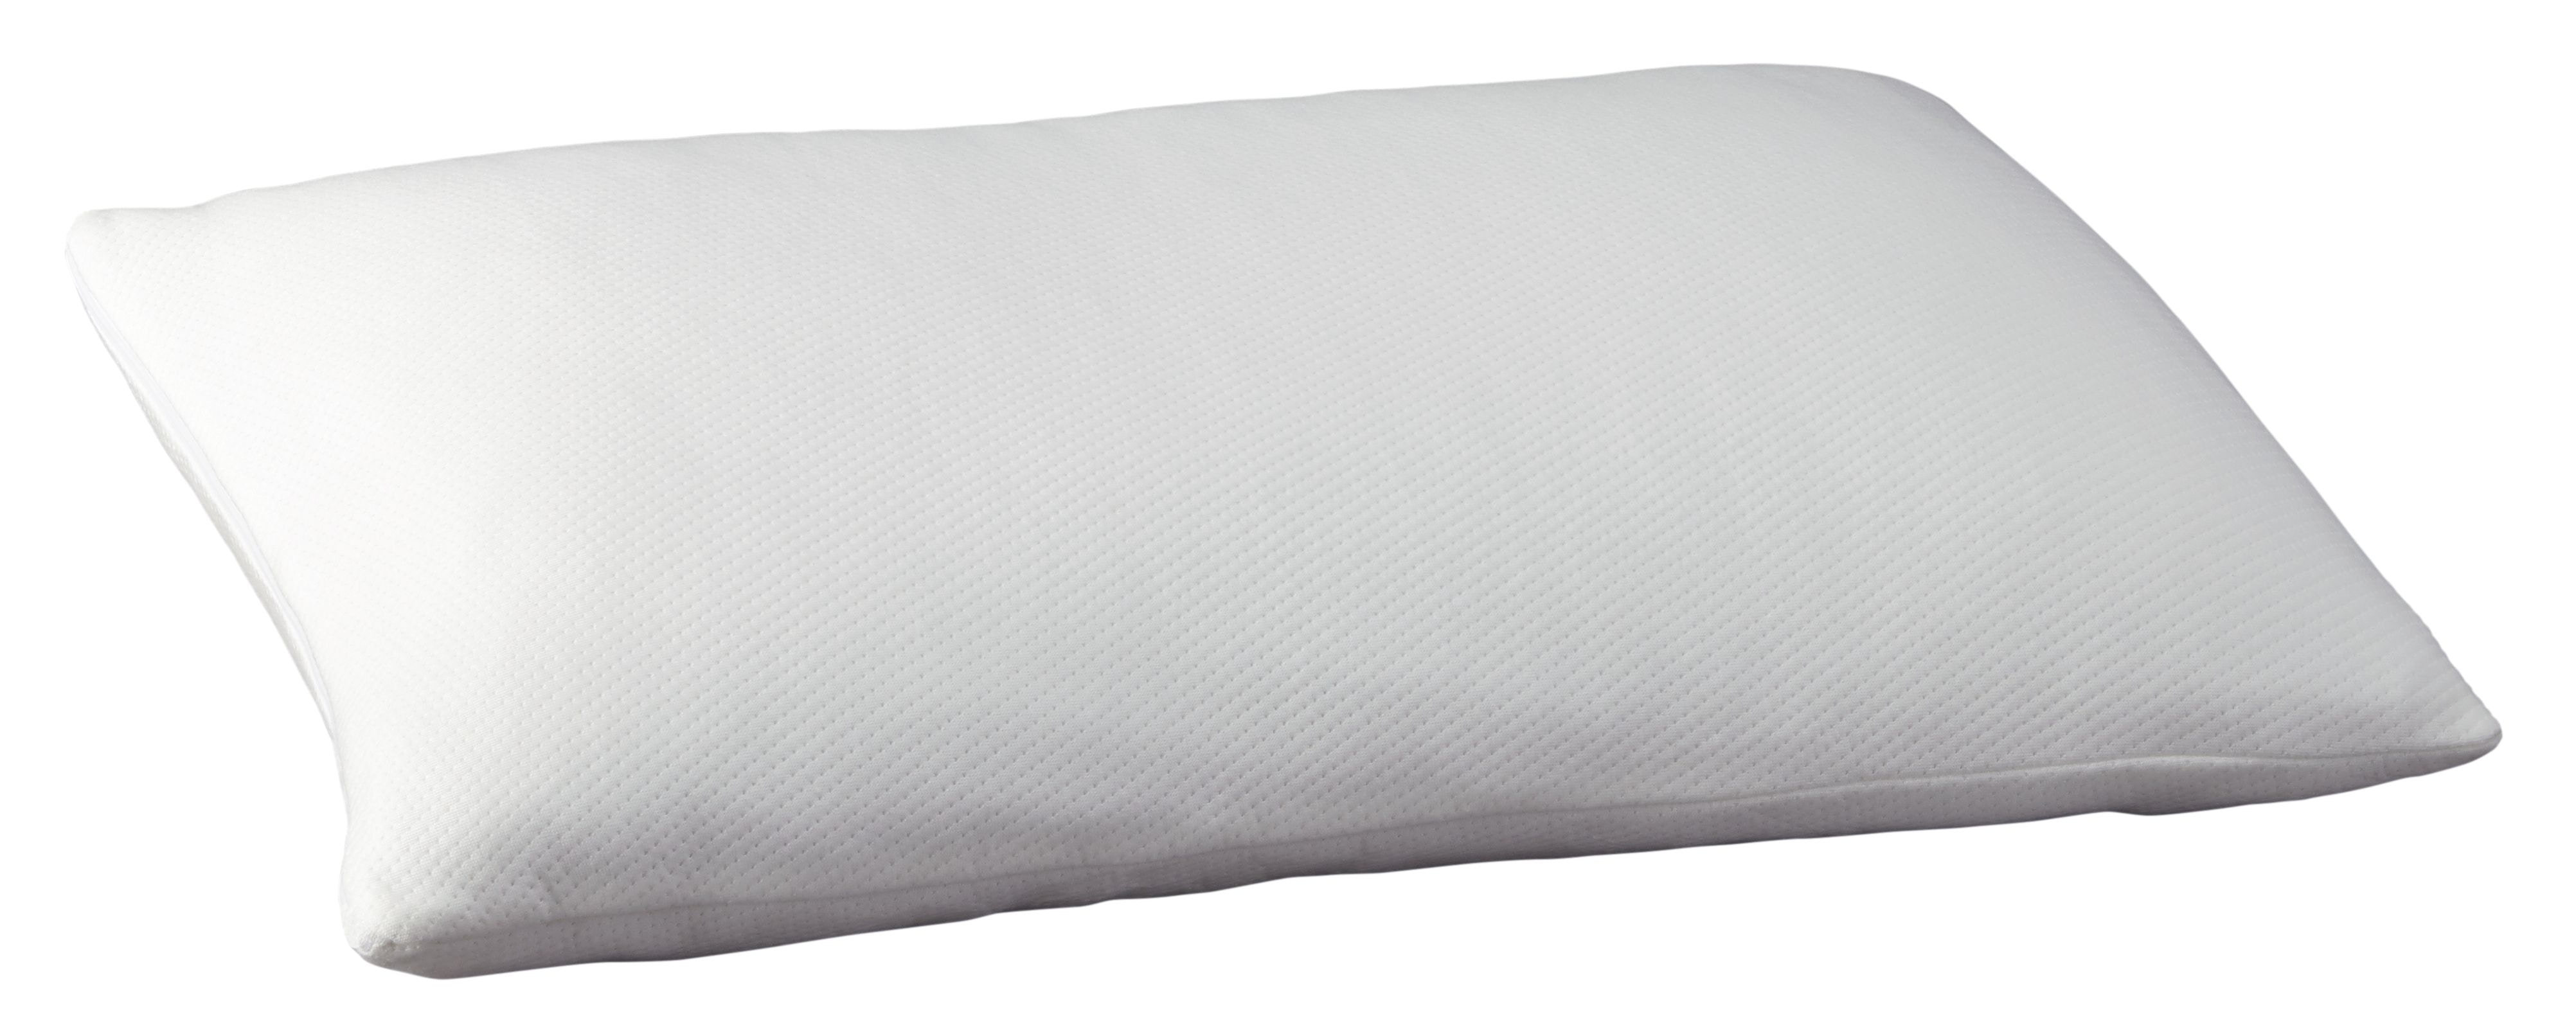 Ashley Sleep Accessories Memory Foam Pillow (10/CS) M82510 At Scholet  Furniture